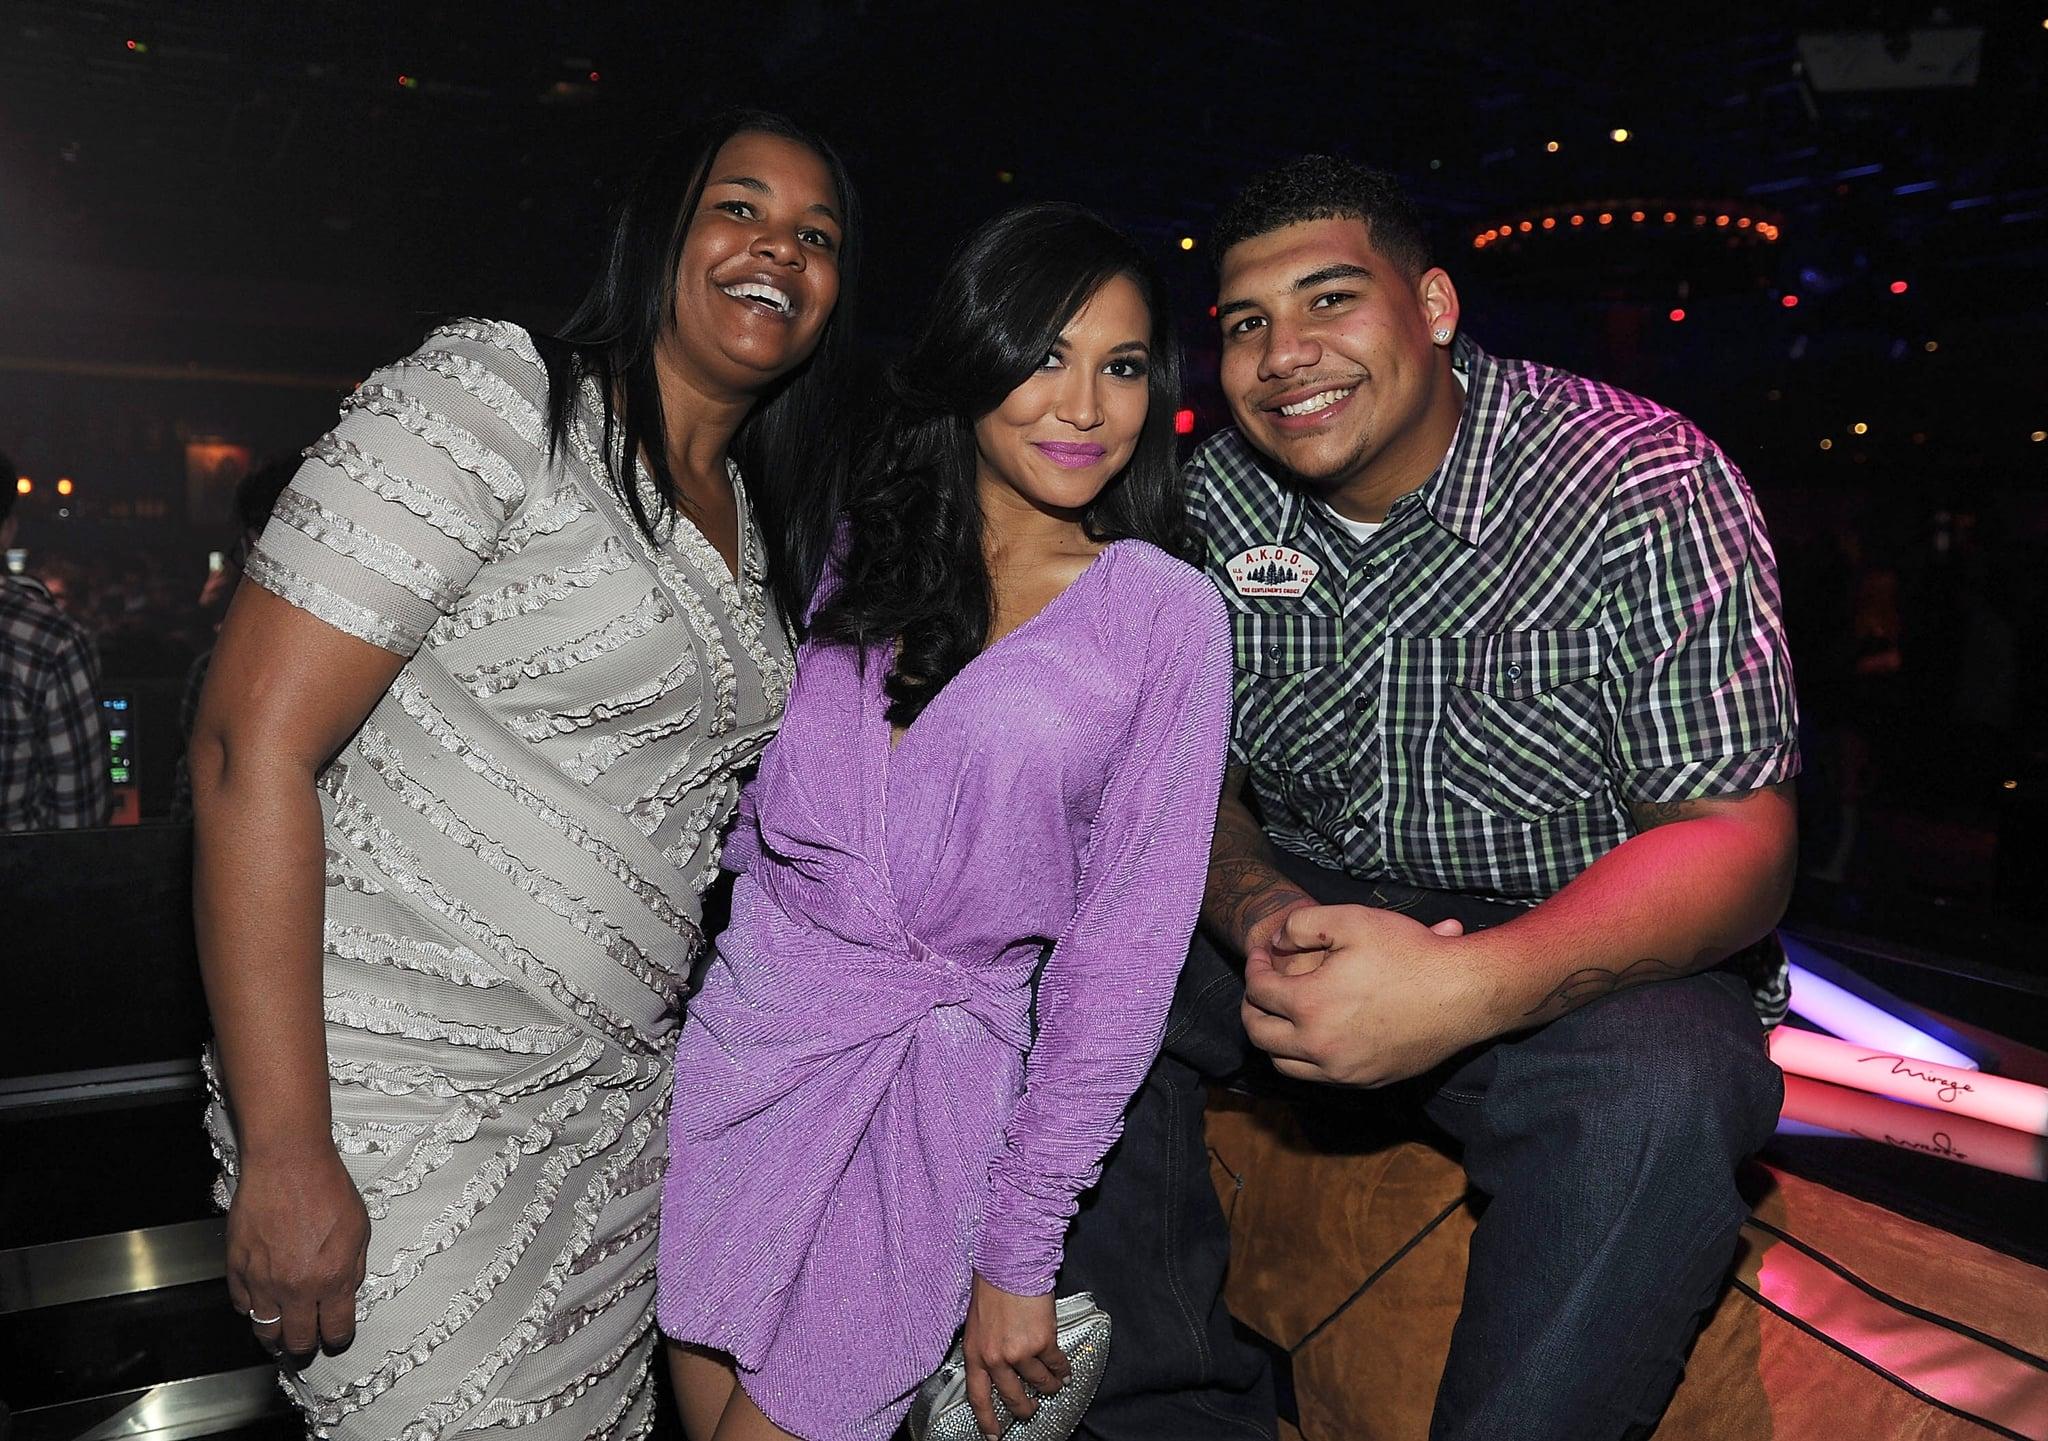 LAS VEGAS, NV - JANUARY 21: (Exclusive Coverage)  Yolanda Rivera, Naya Rivera and Mychal Rivera celebrate Naya Rivera's birthday at 1 OAK Las Vegas at The Mirage on January 21, 2012 in Las Vegas, Nevada.  (Photo by Denise Truscello/WireImage)